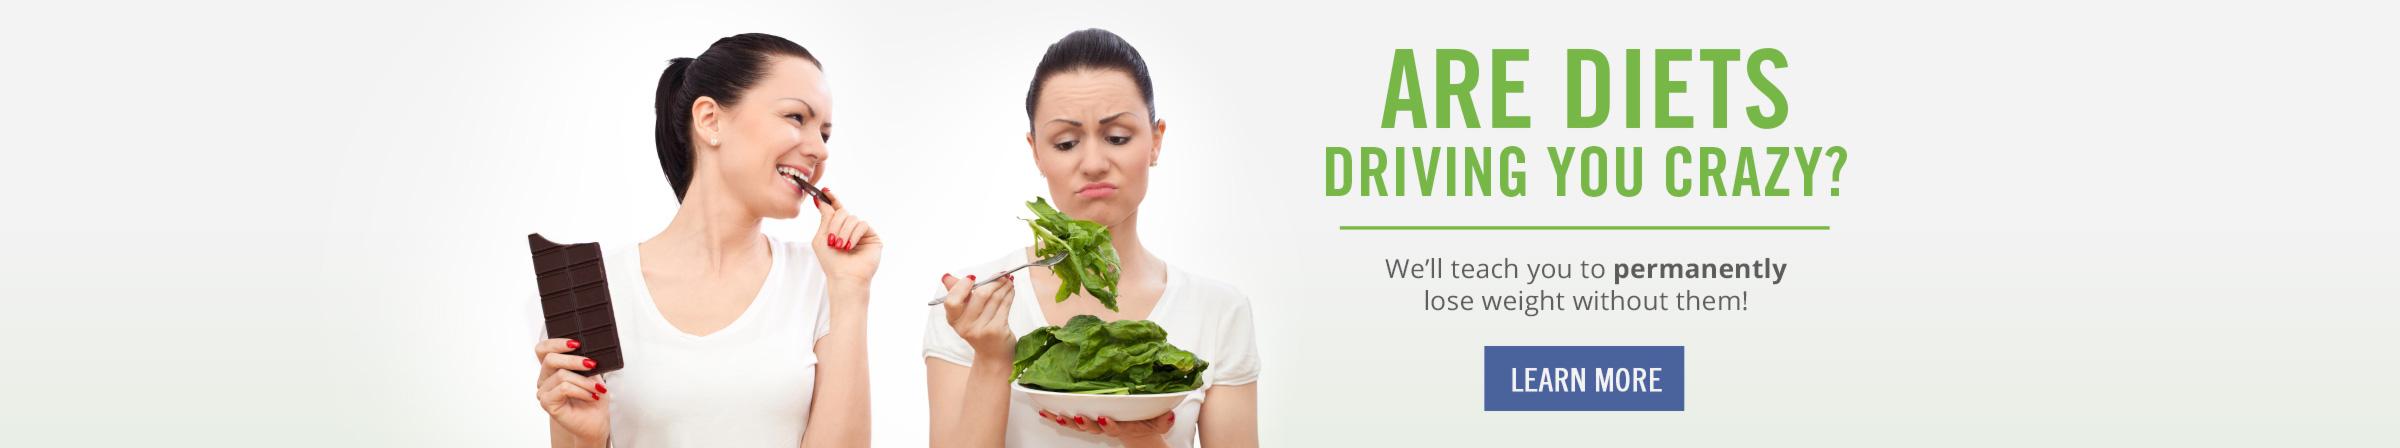 EatingReset-HomepageBanners-5